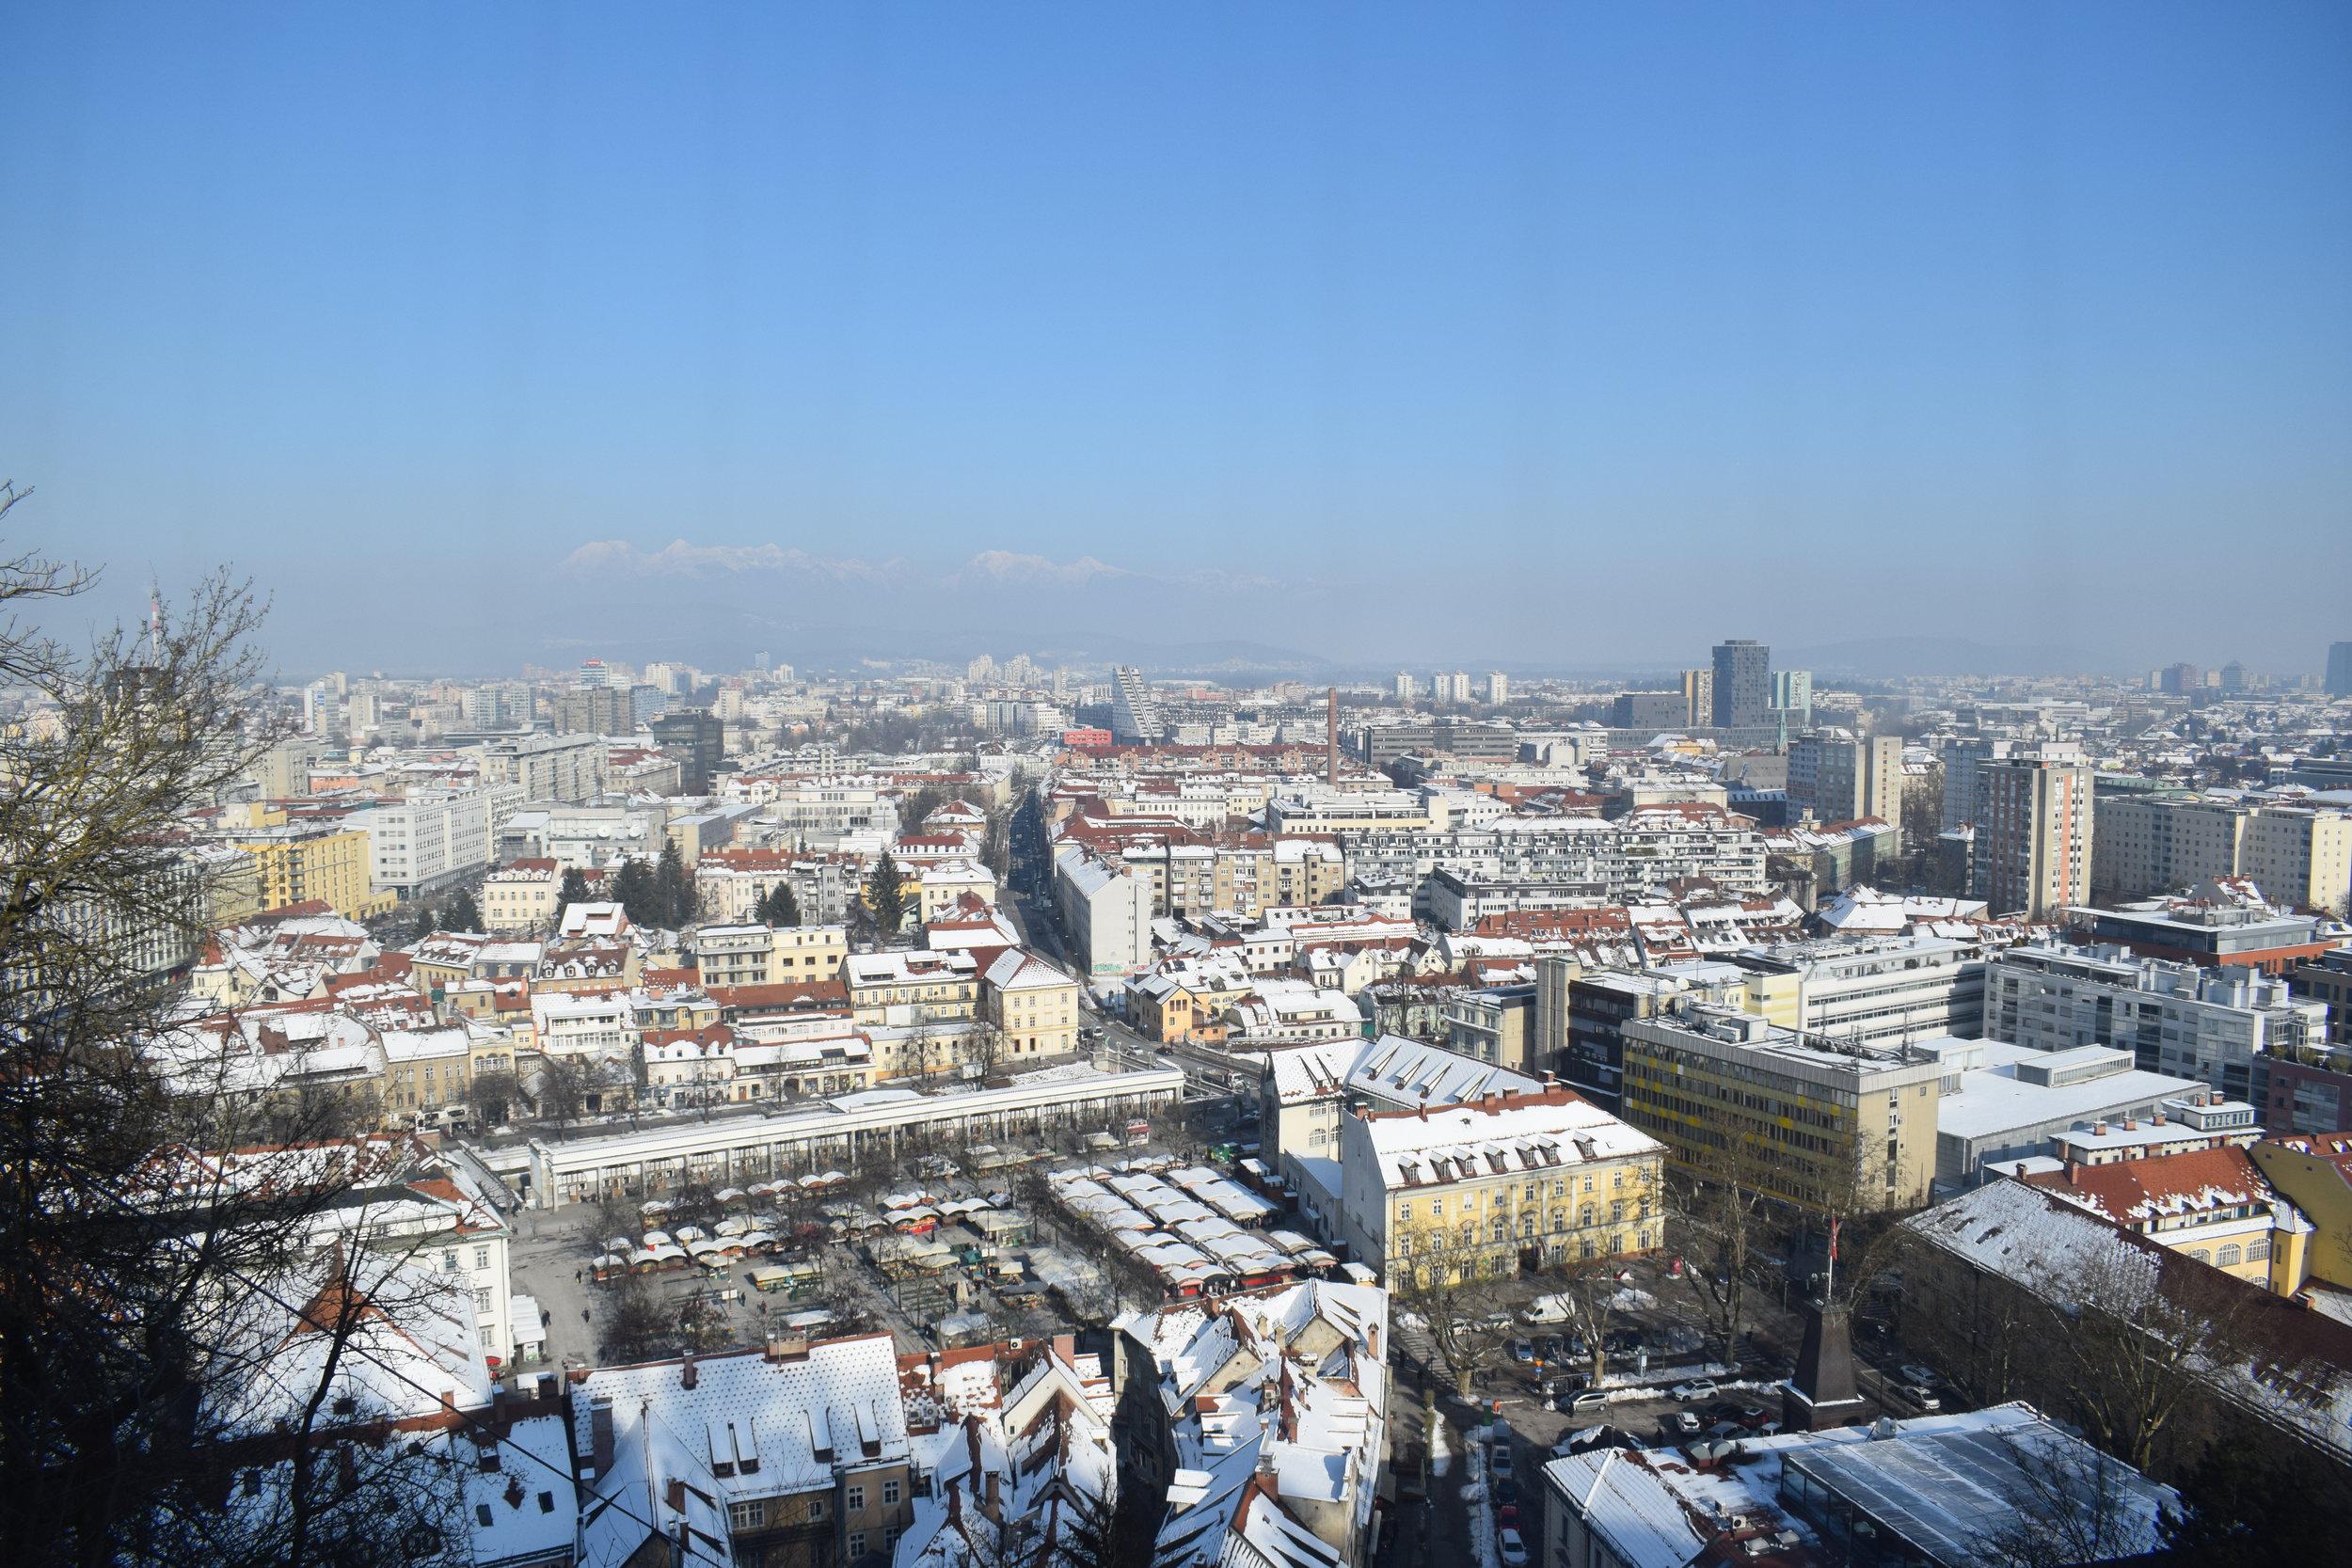 Views over Ljubljana from the Ljubljana funicular.